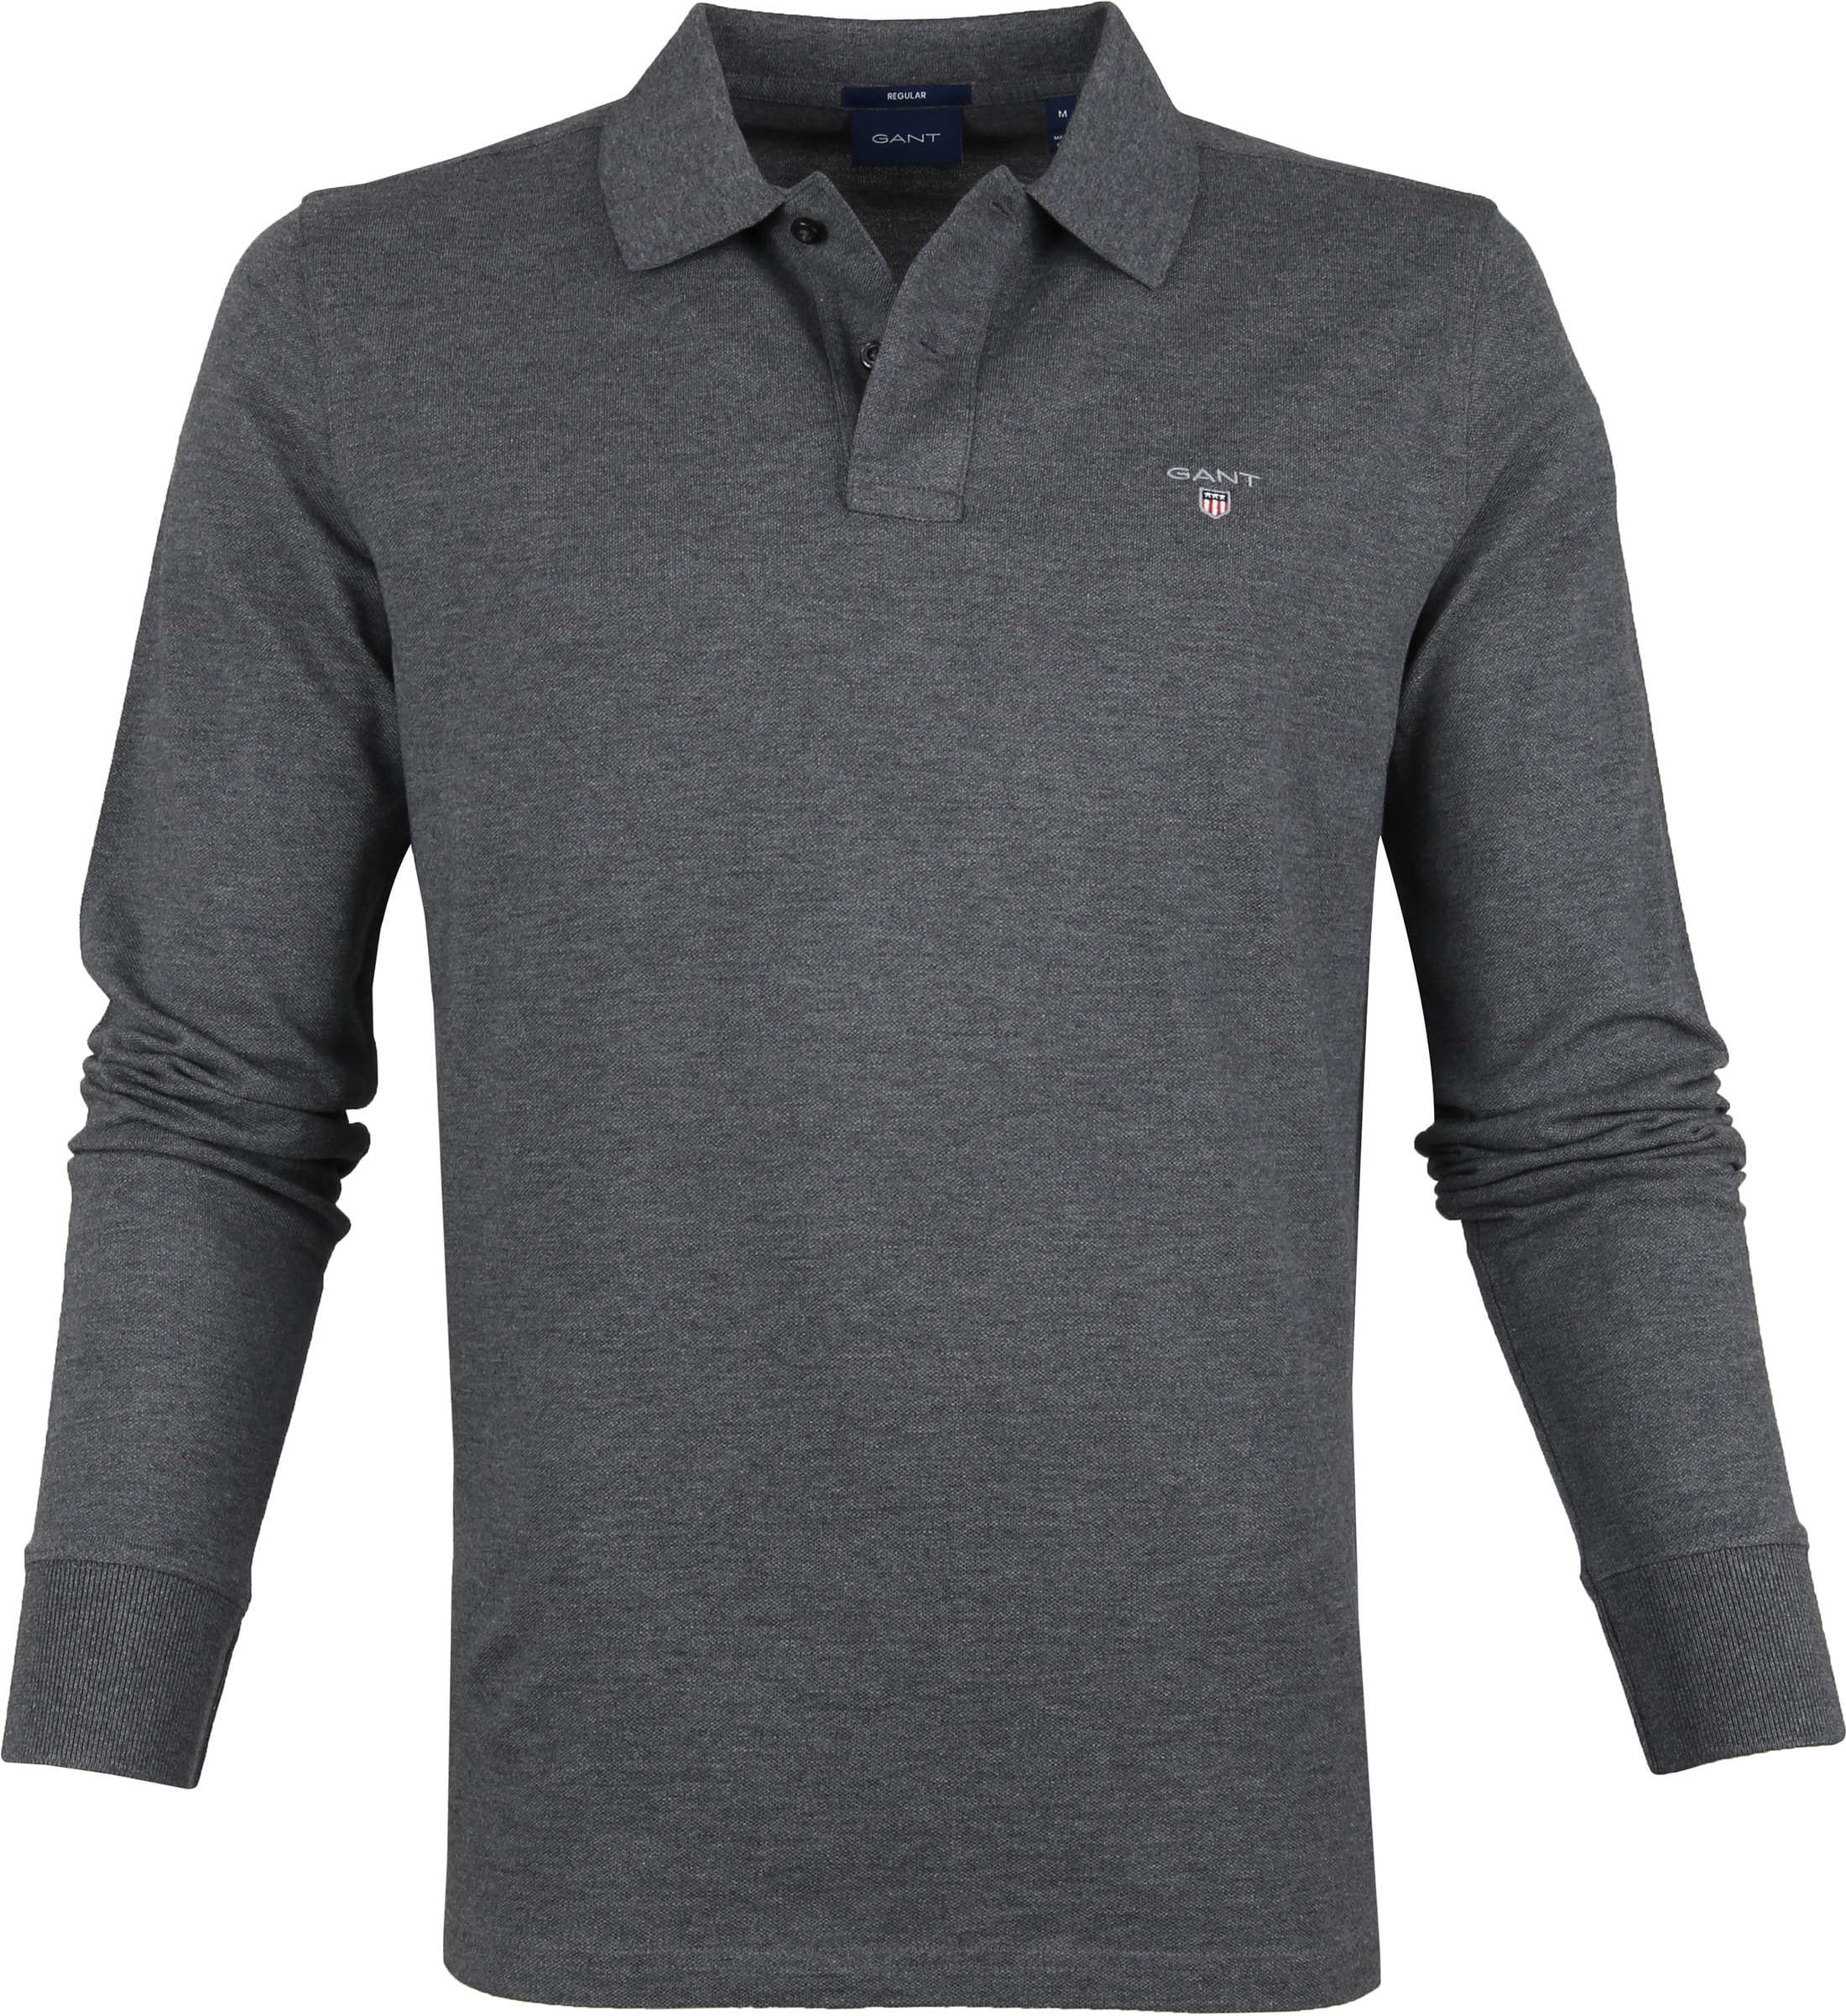 Gant Rugger LS Poloshirt Dark Grey foto 0